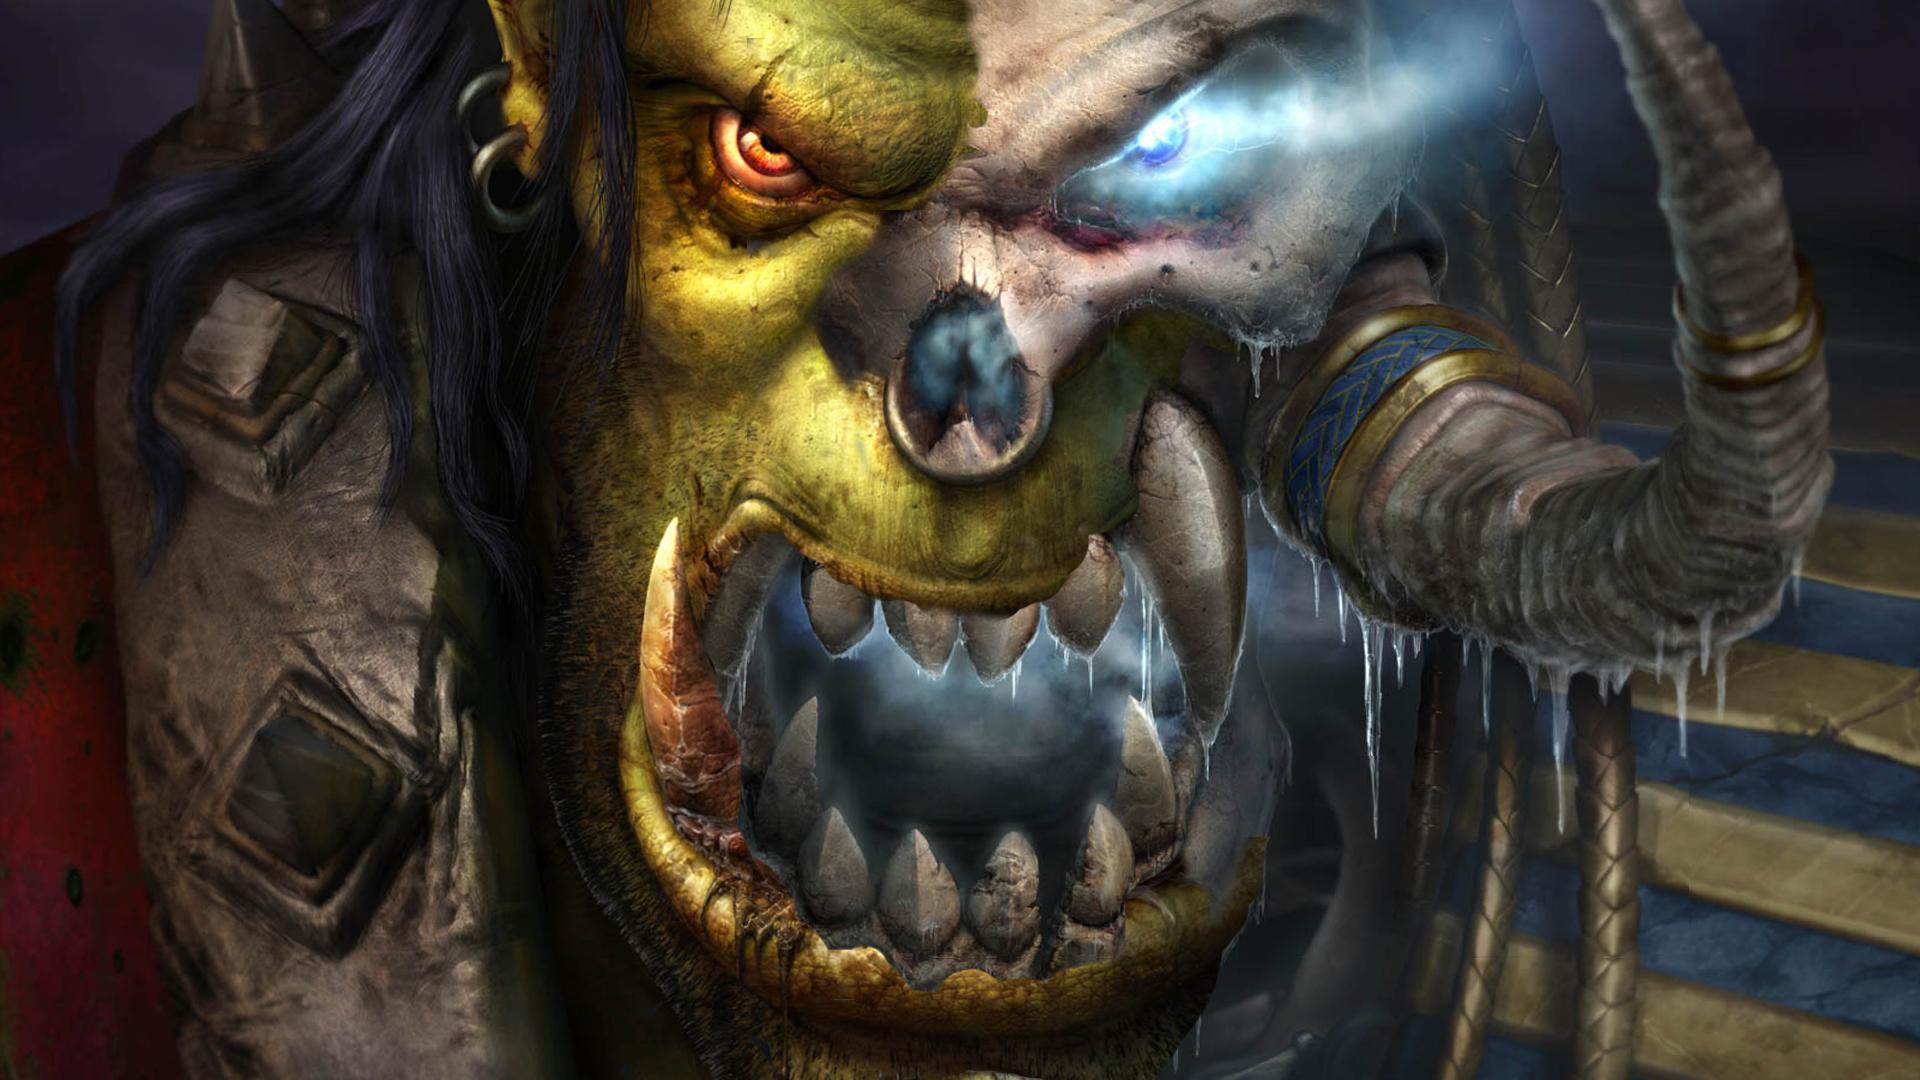 Warcraft3 Undead Undead Orc Wallpaper By Slimebuck On Deviantart